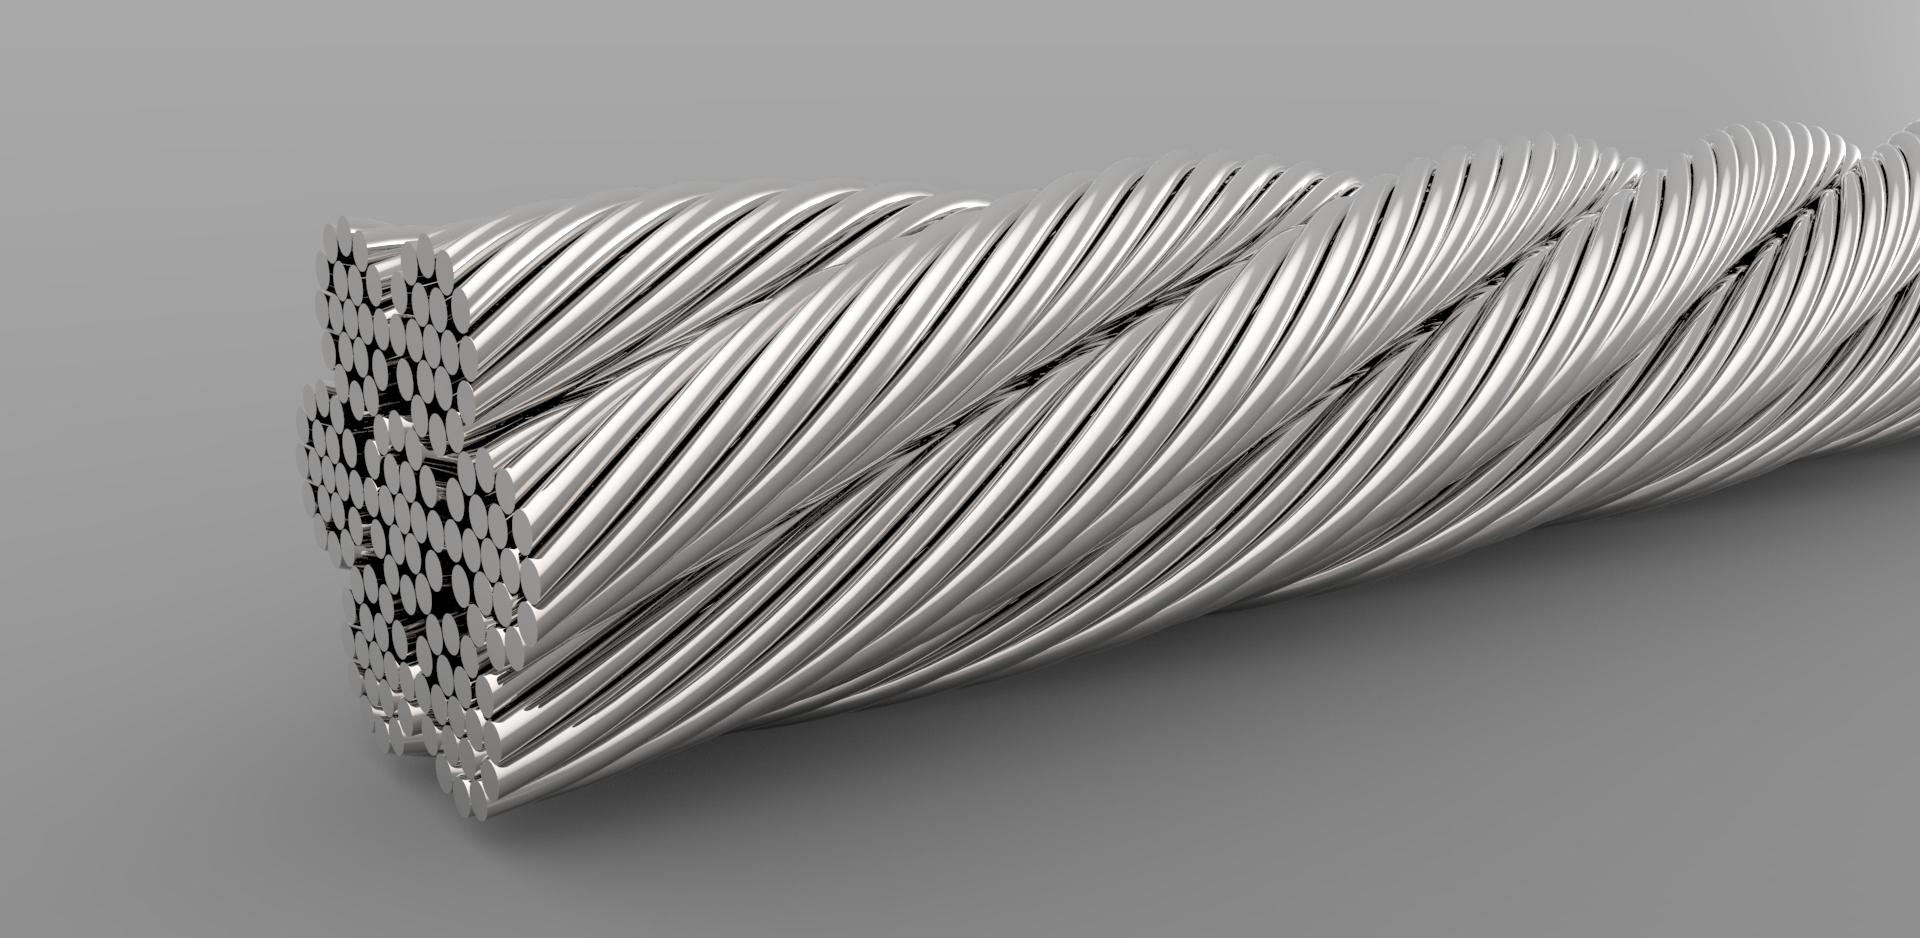 cable steel钢丝缆绳模型3D图纸 Solidworks设计